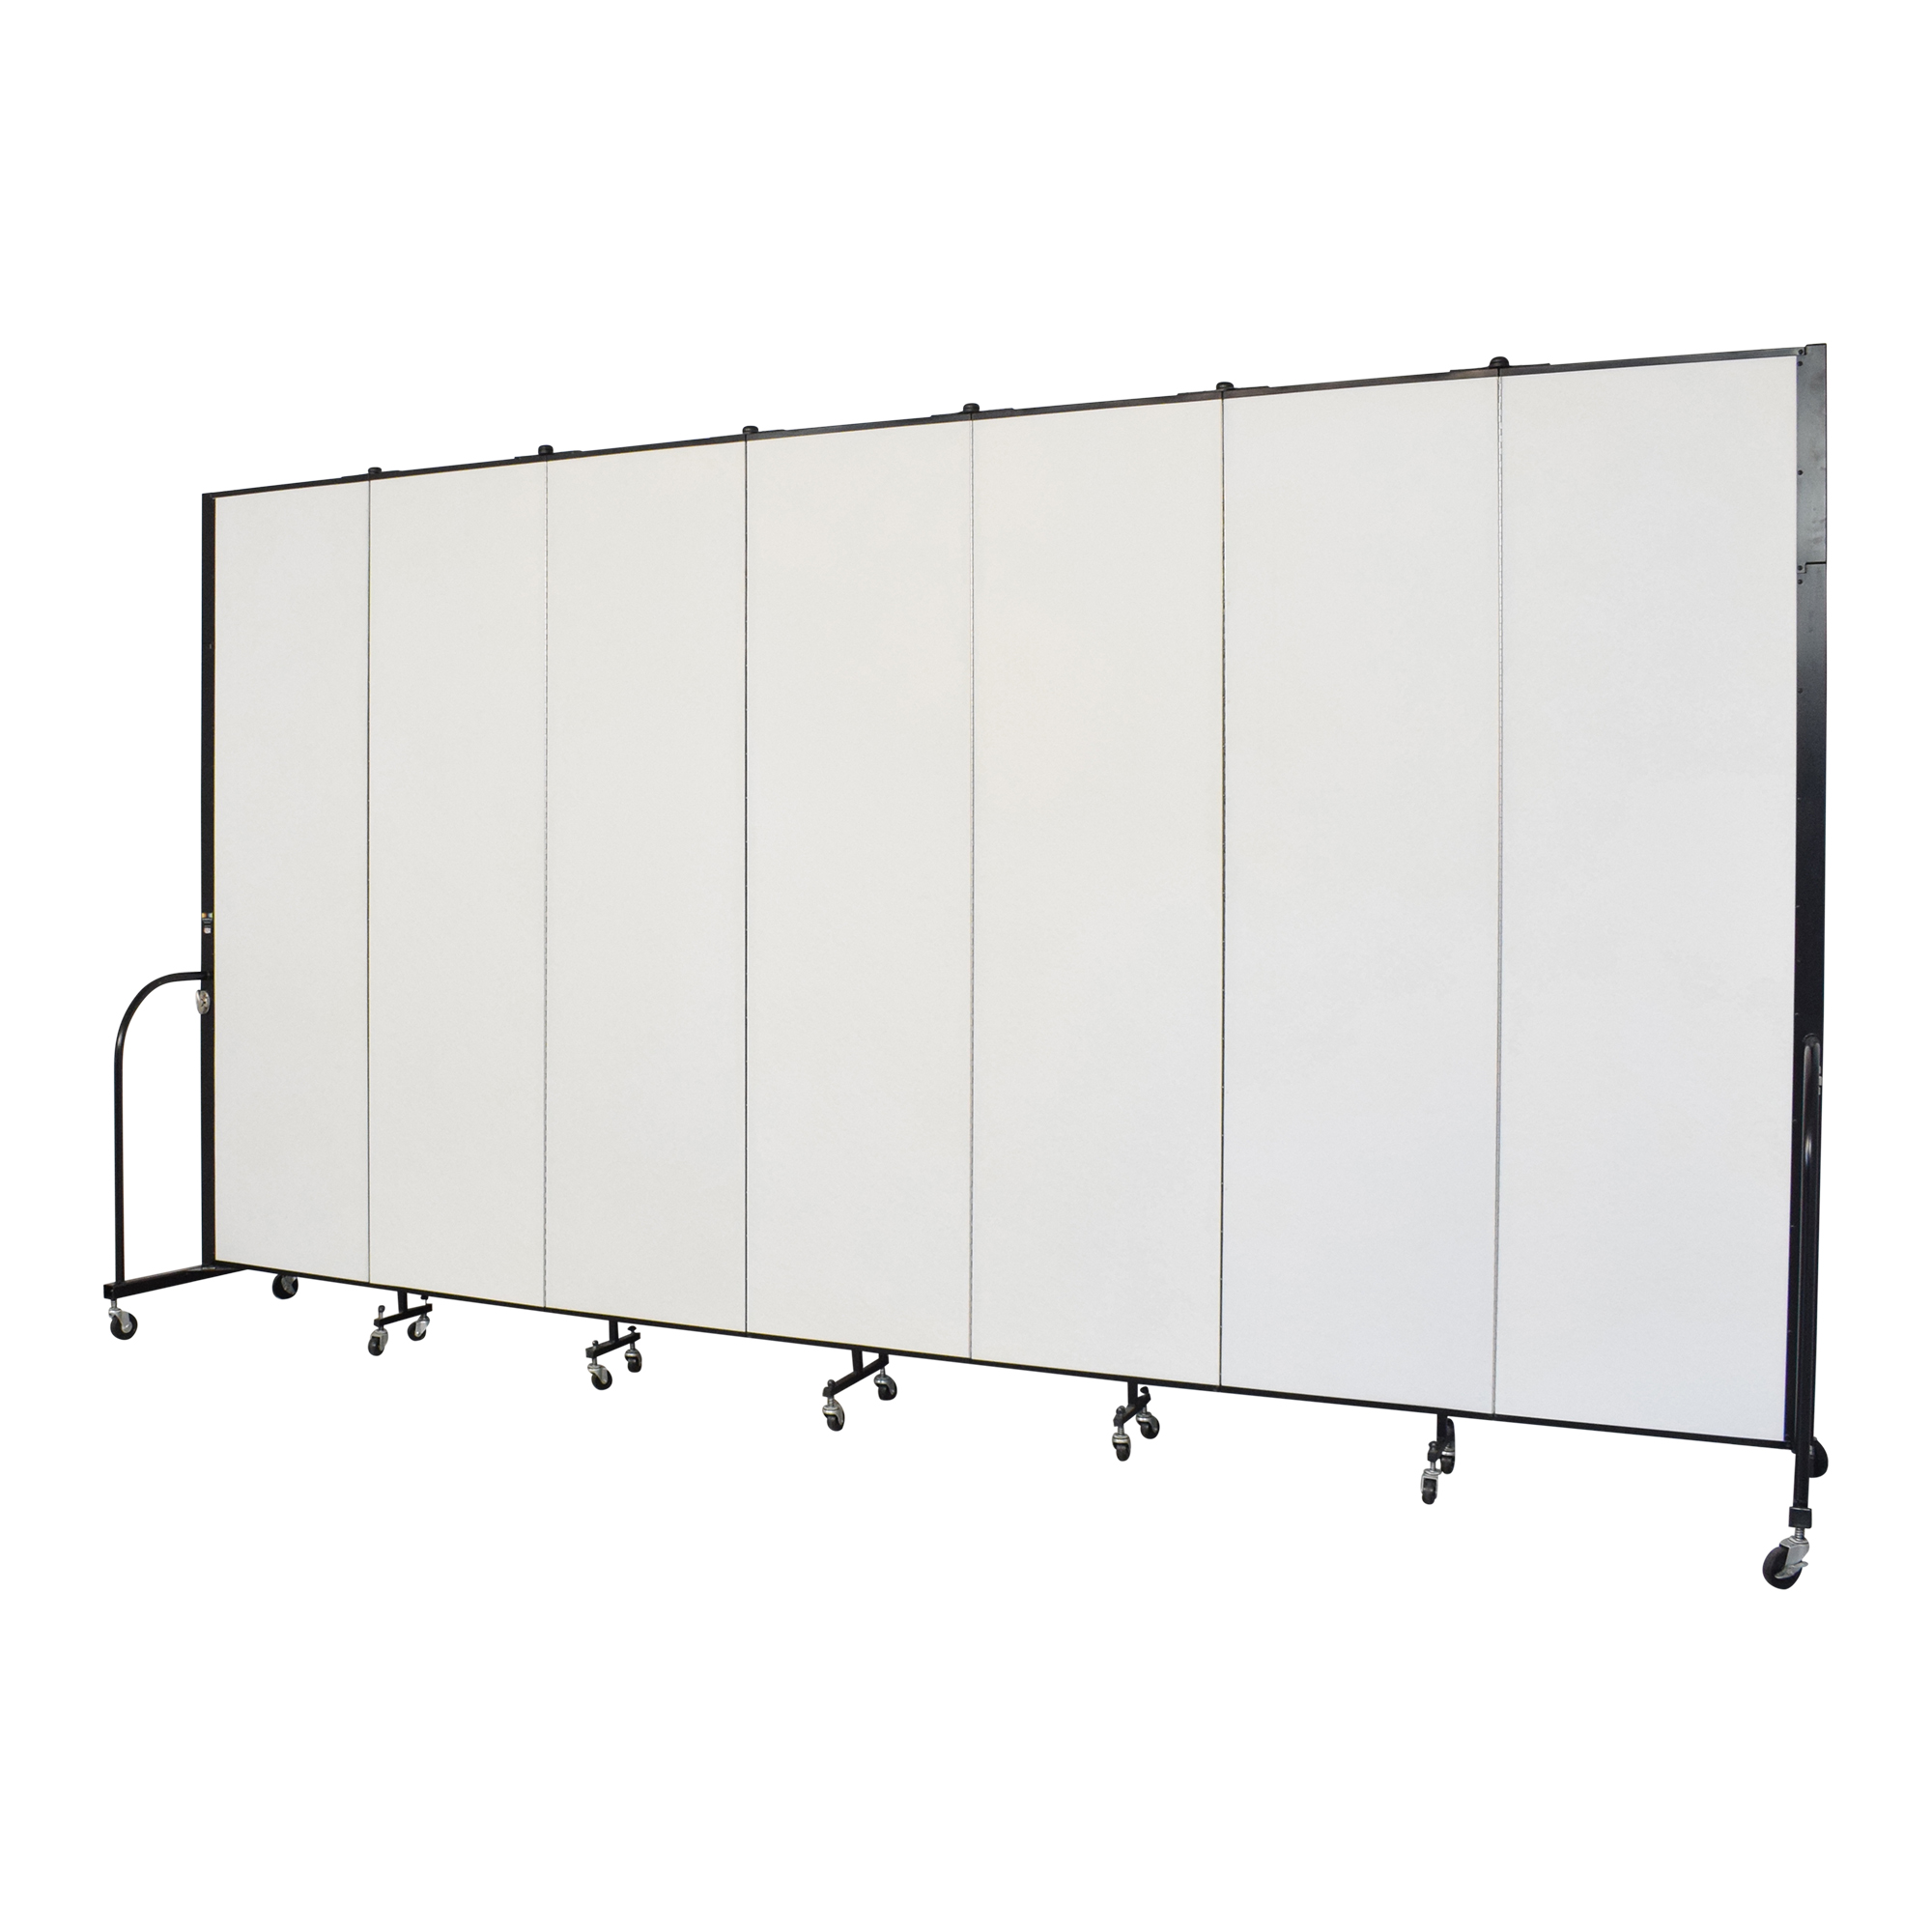 shop Screenflex Portable Room Divider Screenflex